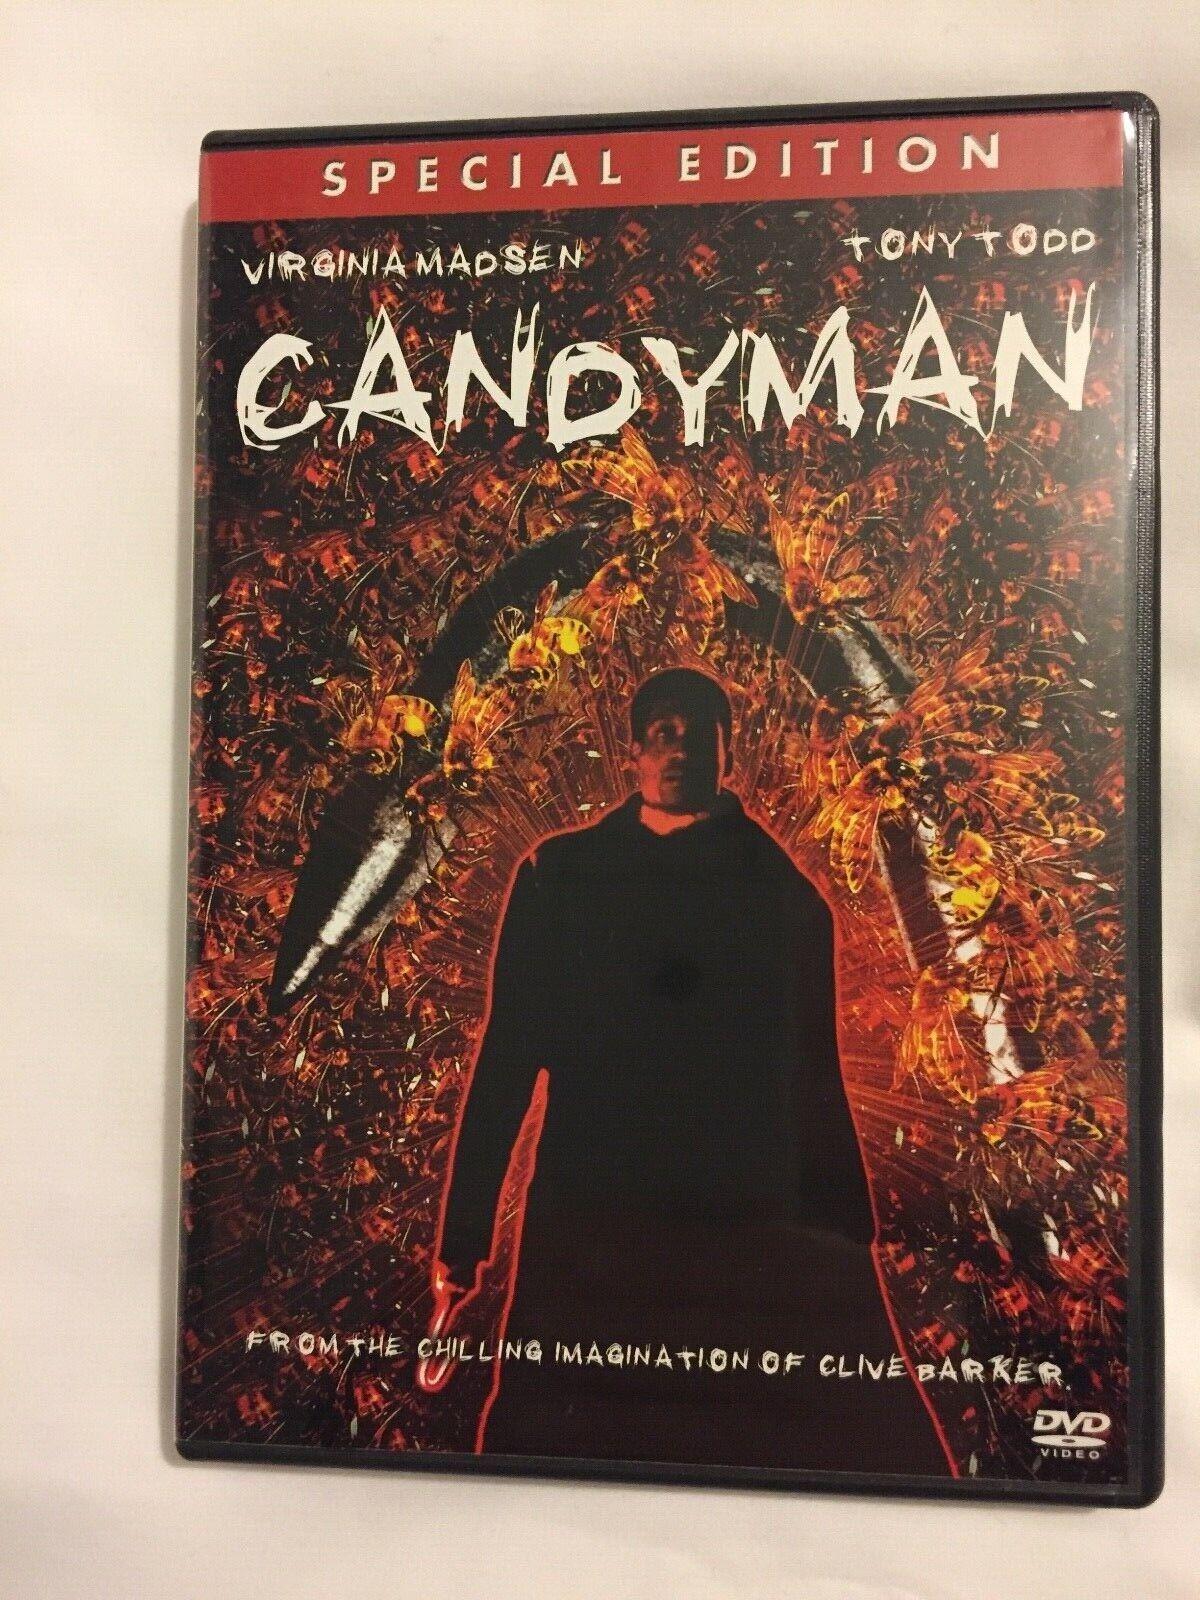 Candyman (Clive Barker, Virginia Madsen, Tony Todd) - DVD ZONE 1 EN PARFAIT ÉTAT